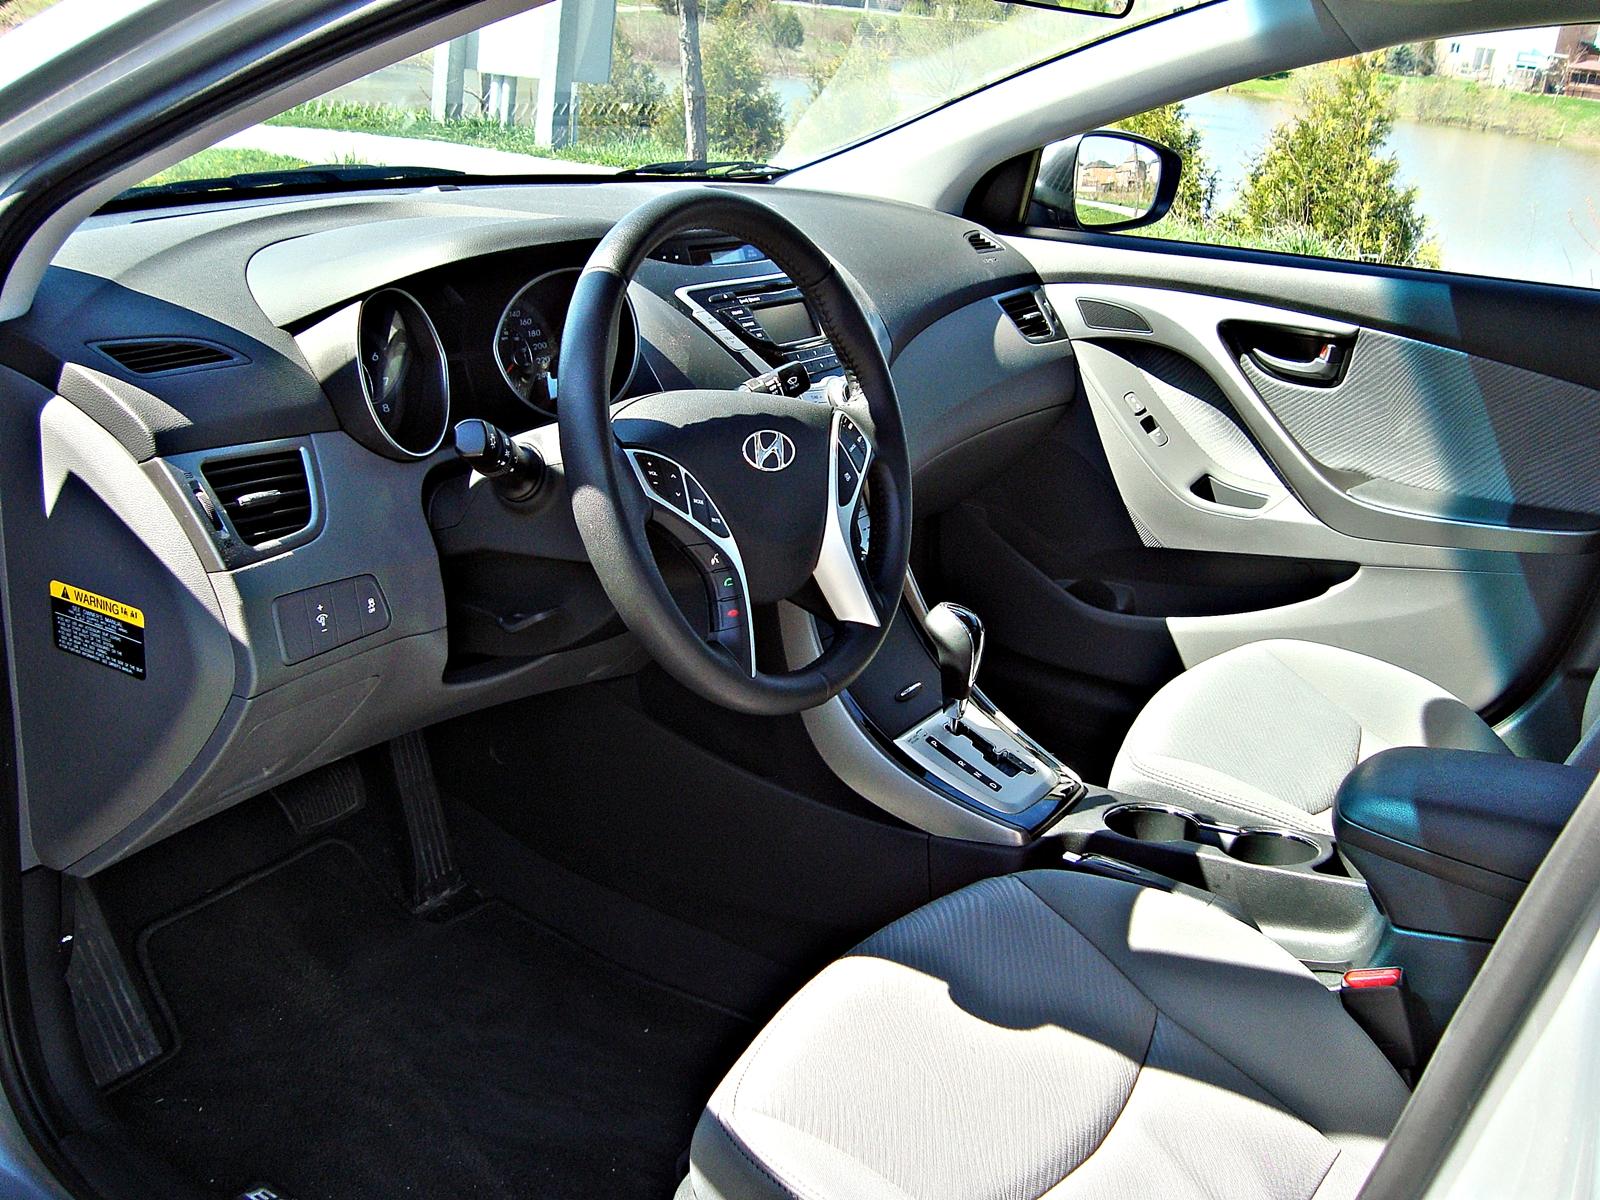 test drive 2011 hyundai elantraHyundai Elantra Interior Right Hand Drive #2